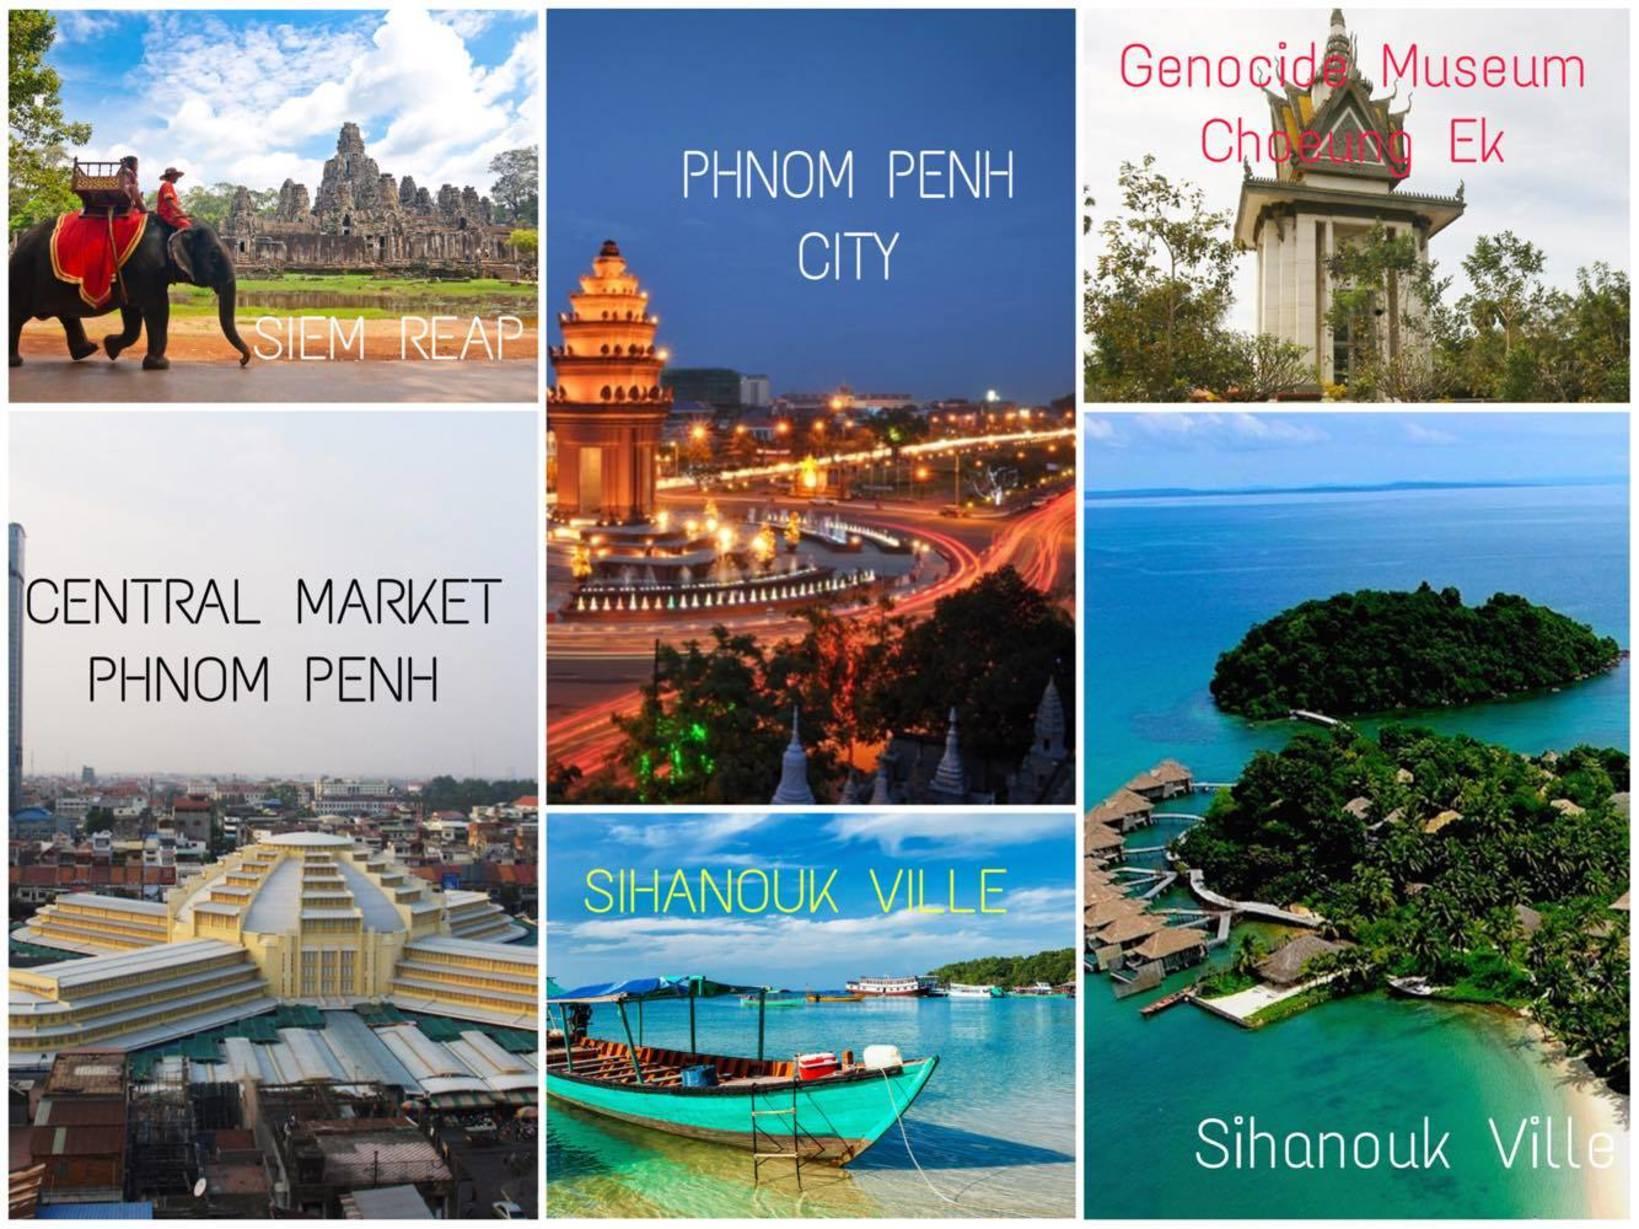 Plасеѕ to visit in Cambodia